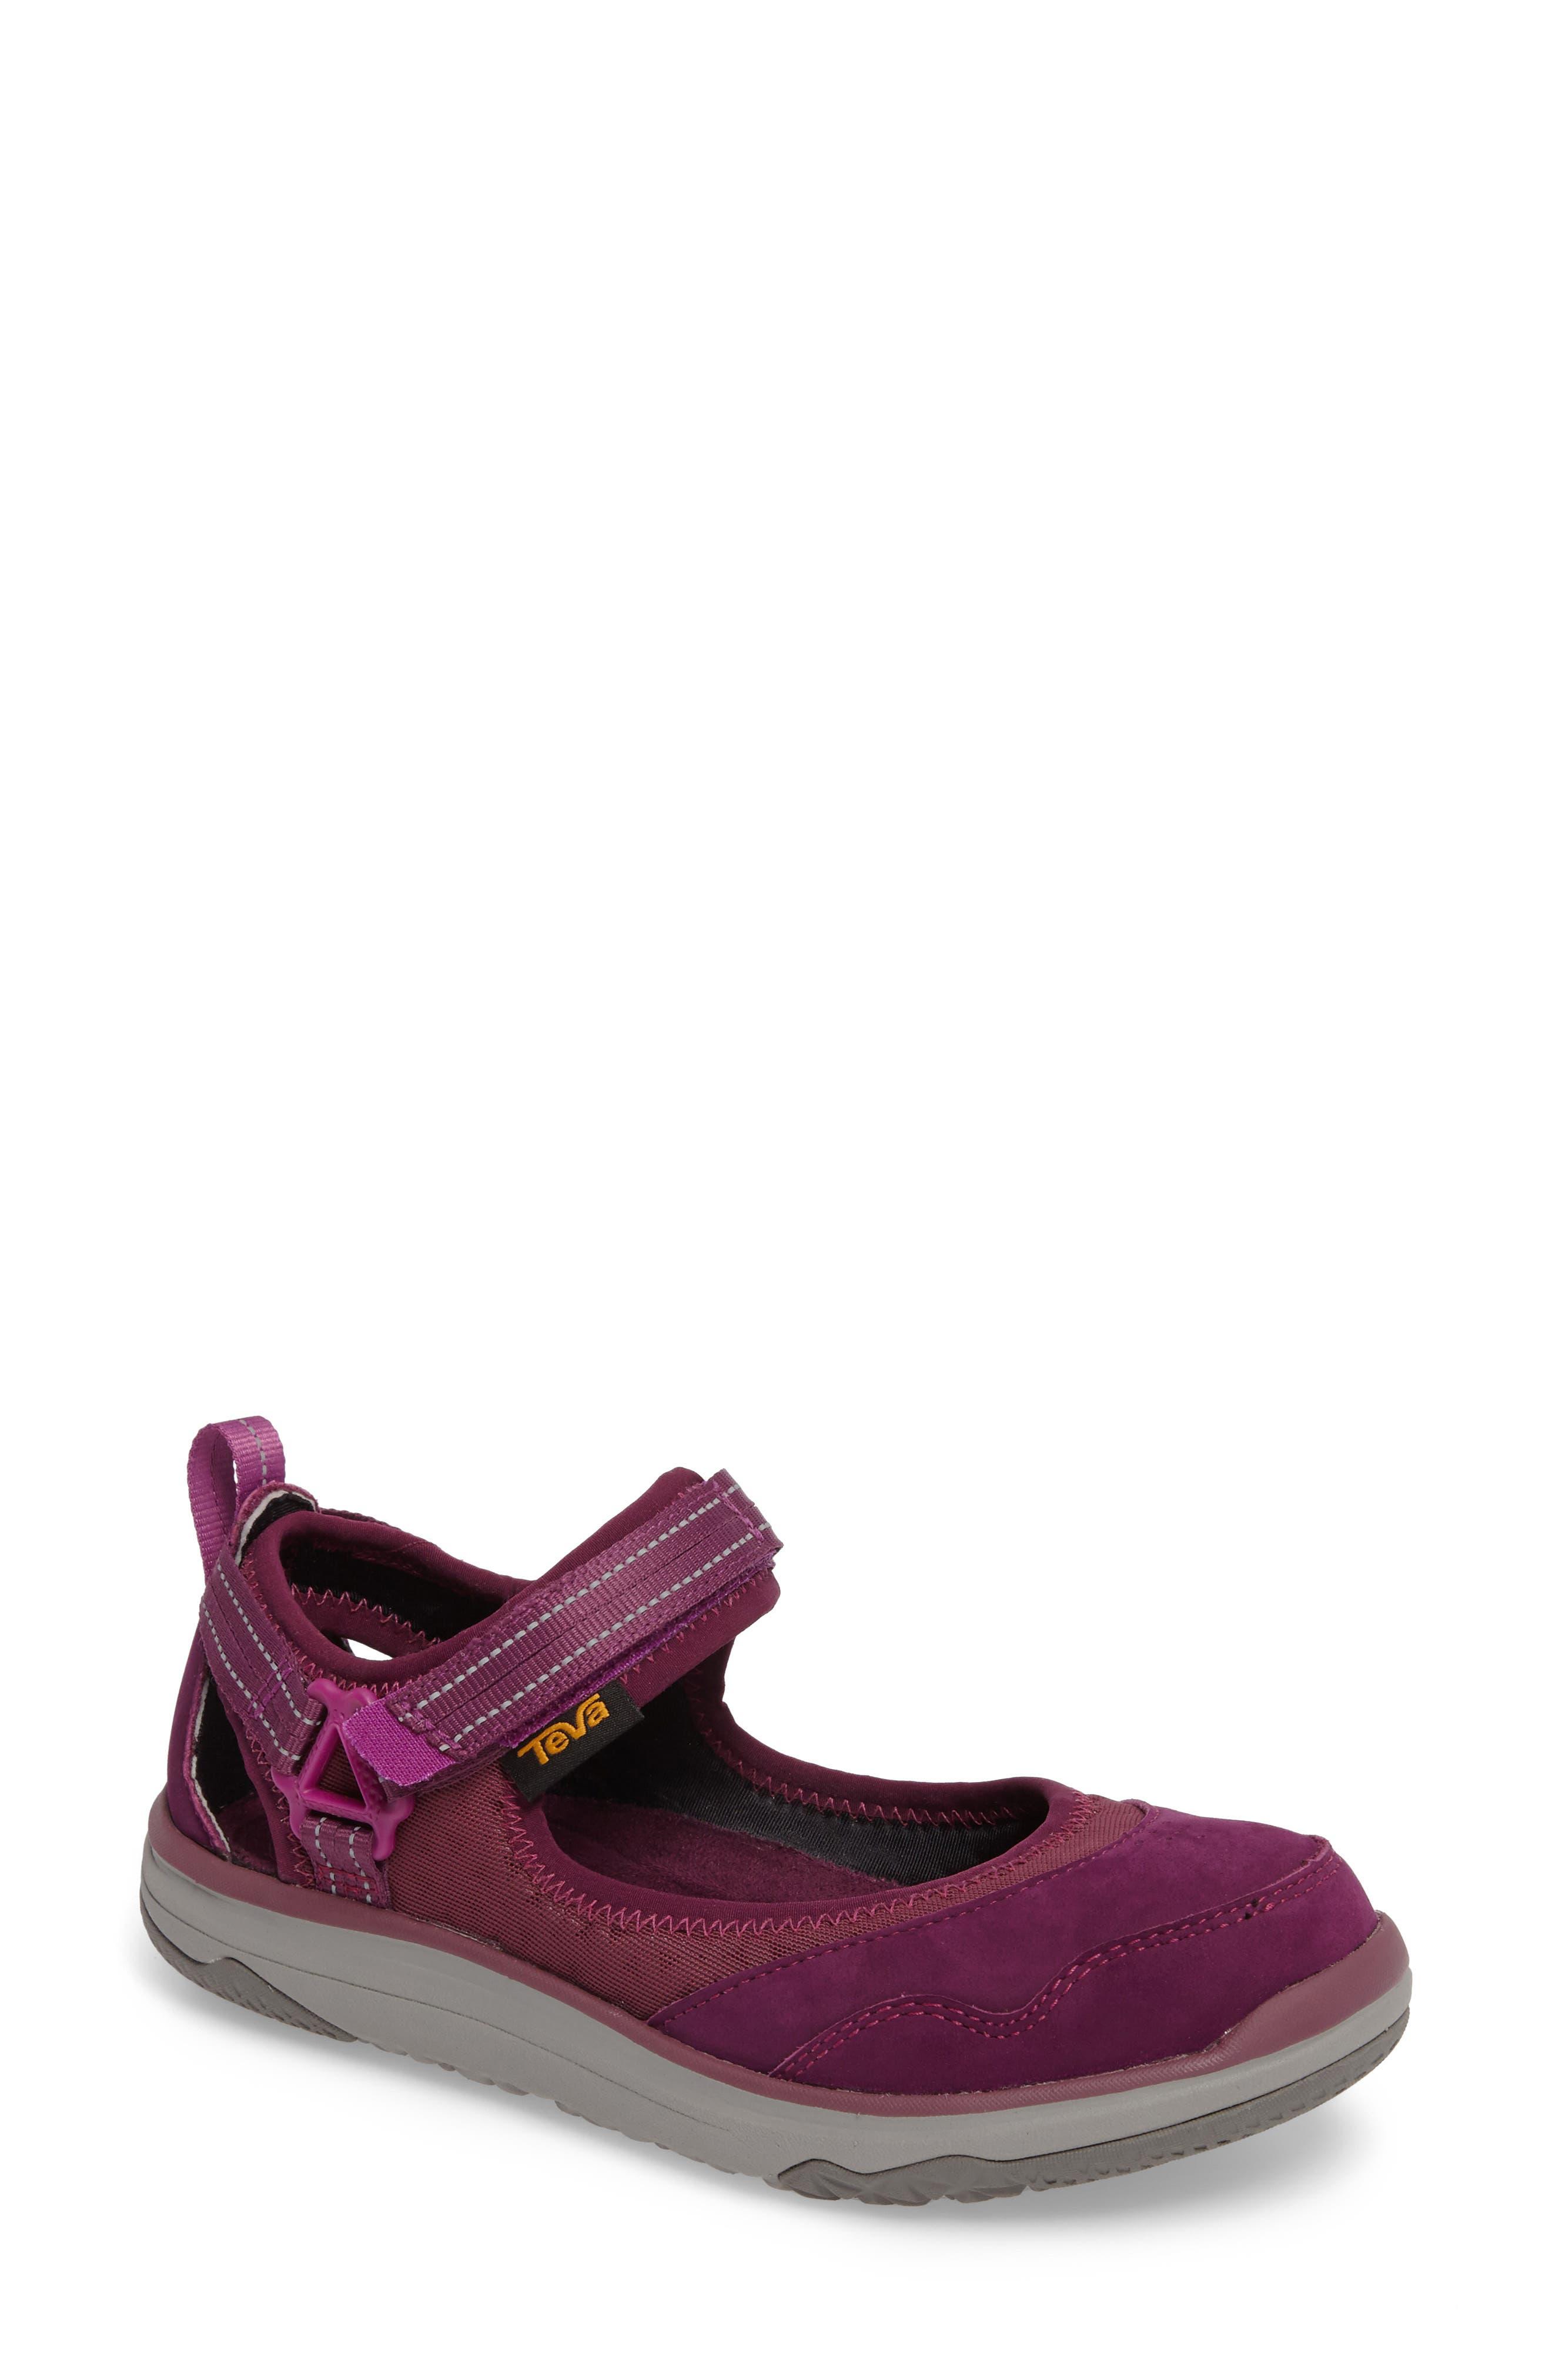 Terra Float Travel Mary Jane Flat,                             Main thumbnail 1, color,                             Dark Purple Leather